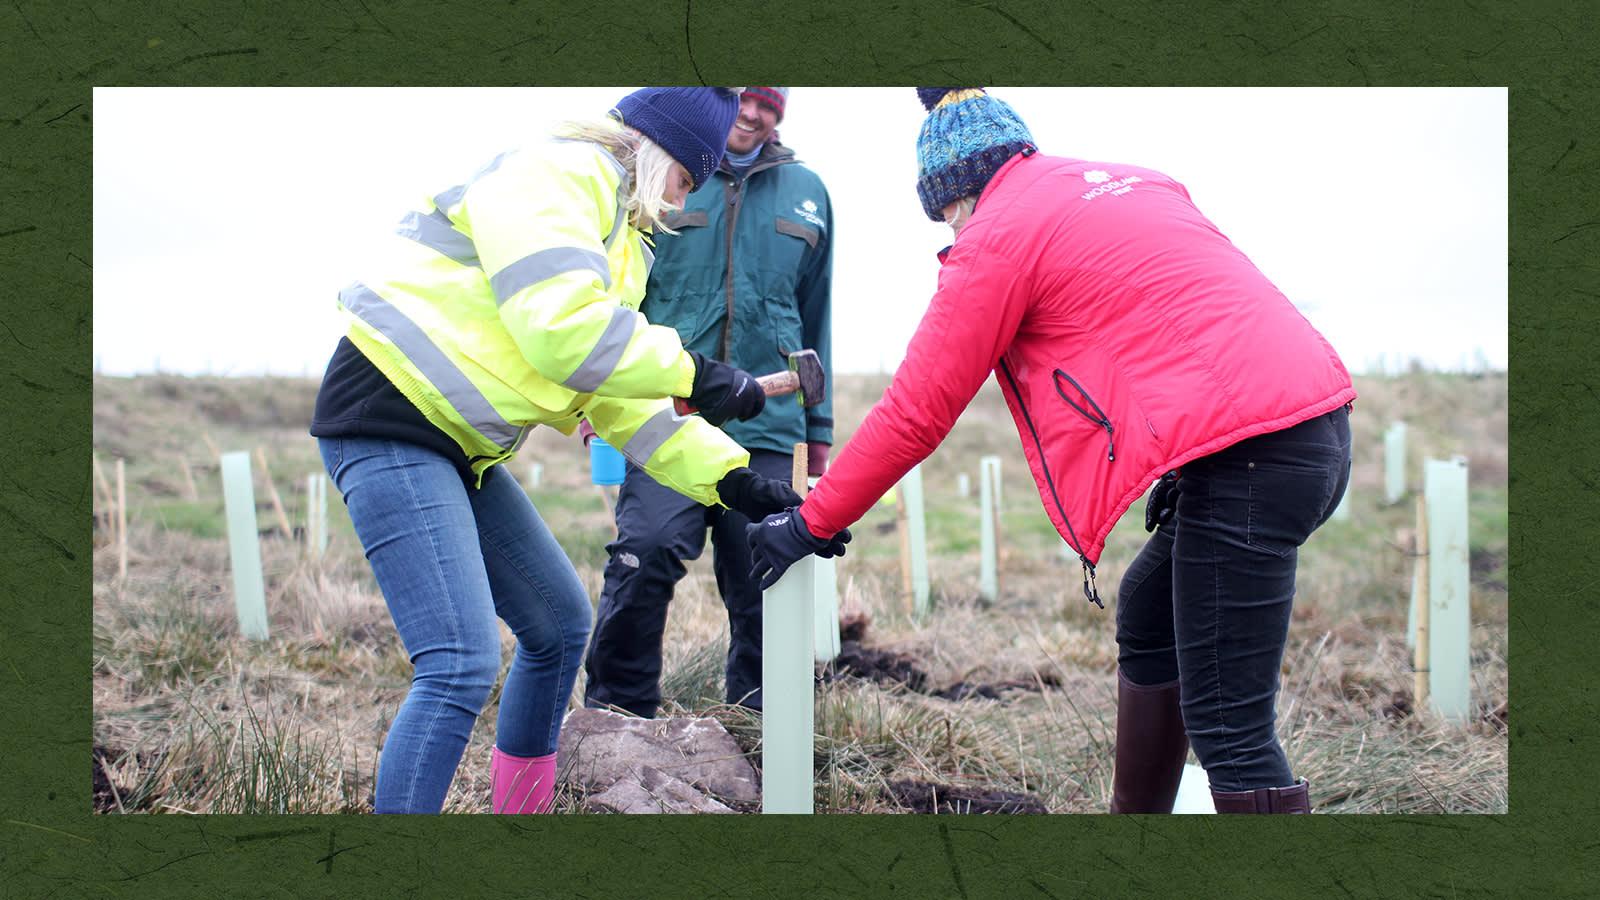 Sally Hopson planting a tree